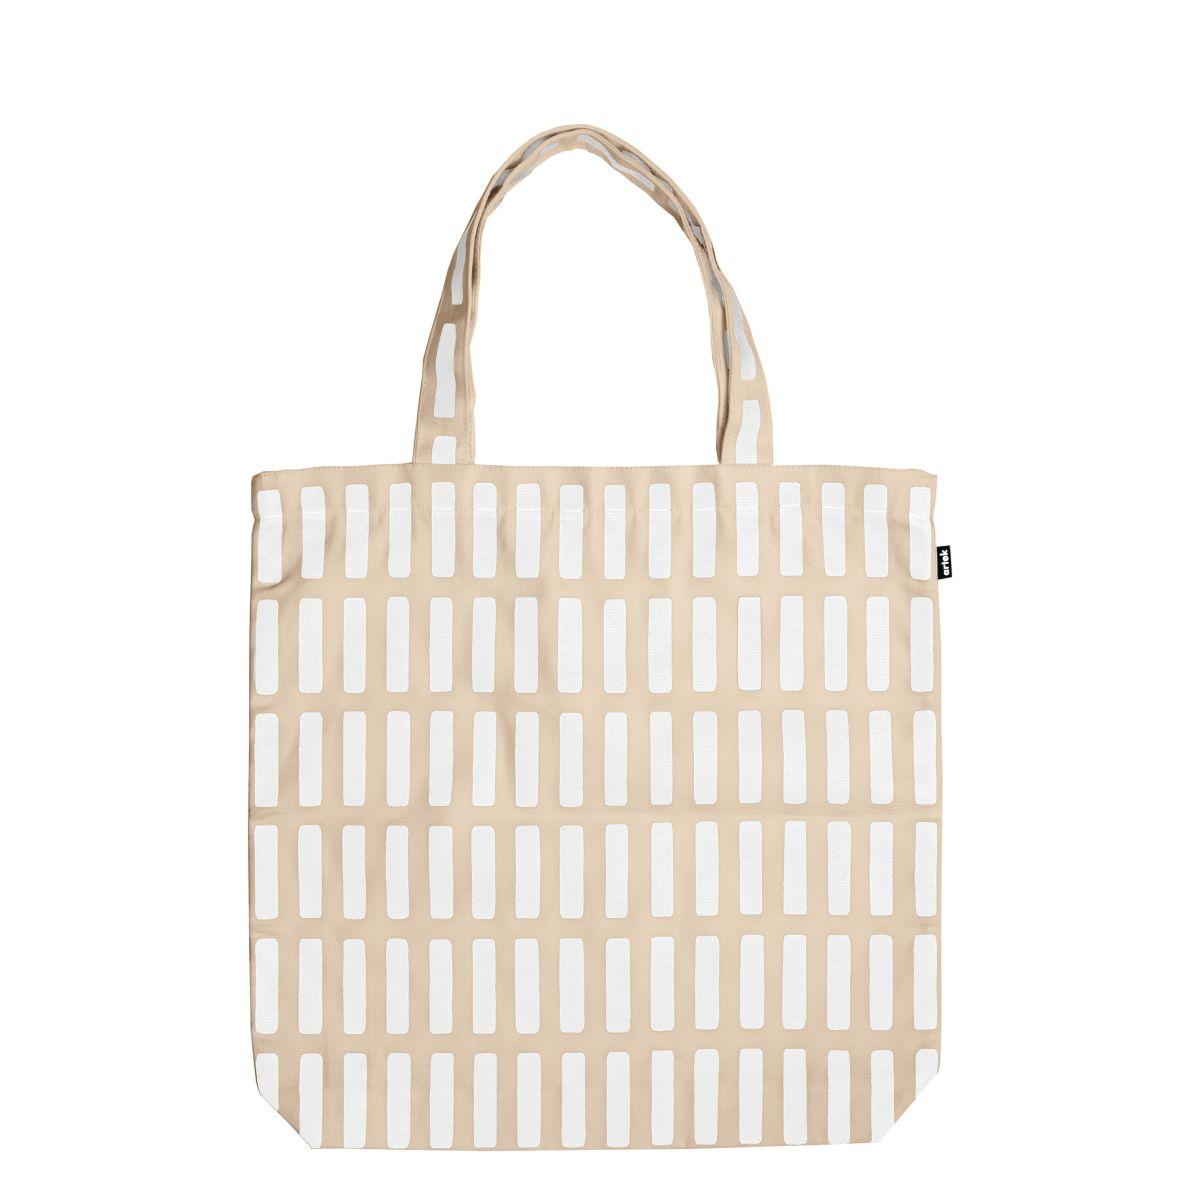 Siena-Canvas-Bag-sand-white-3976616